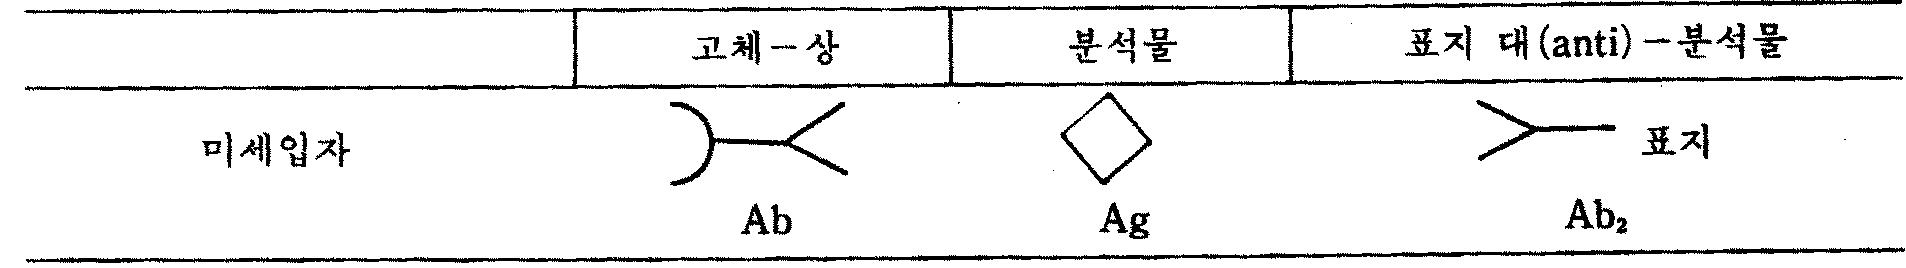 Figure kpo00001